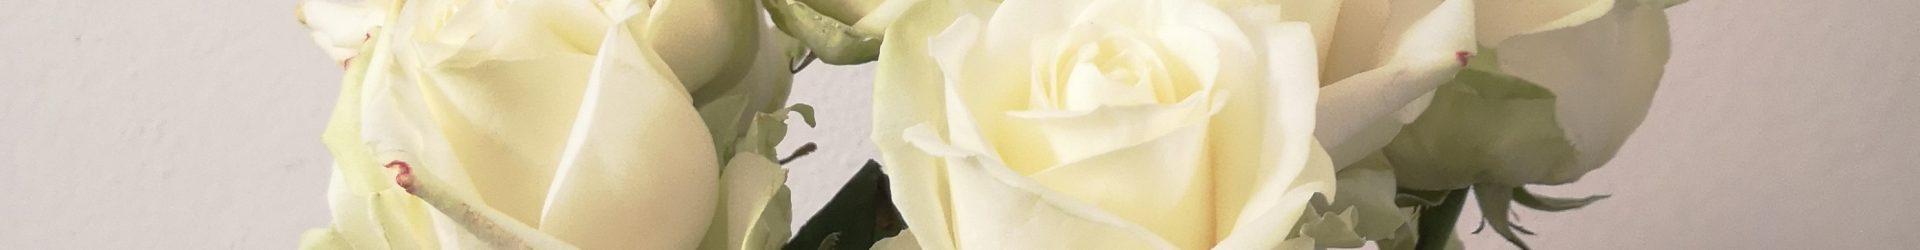 Dozzina di rose bianche